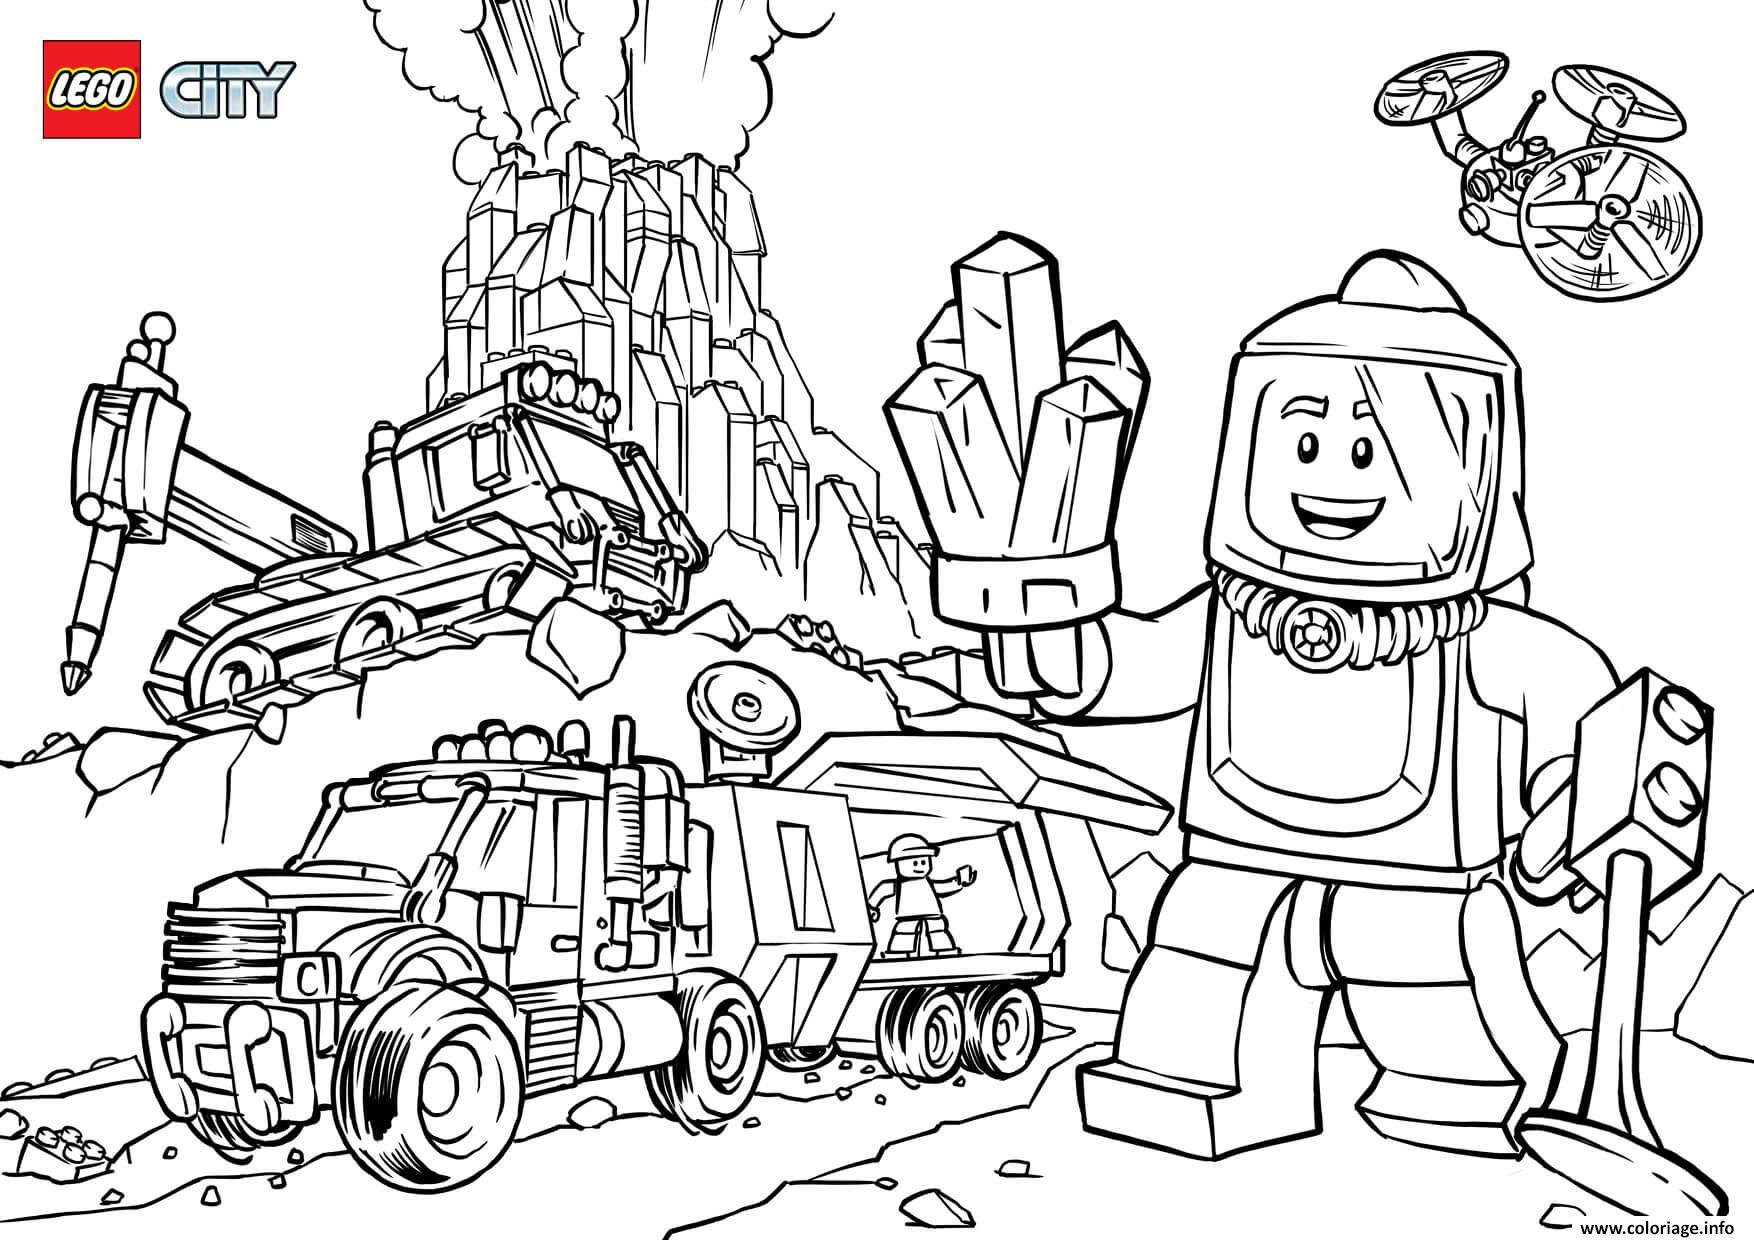 Coloriage Lego City Volcano Explorers Jecolorie Com